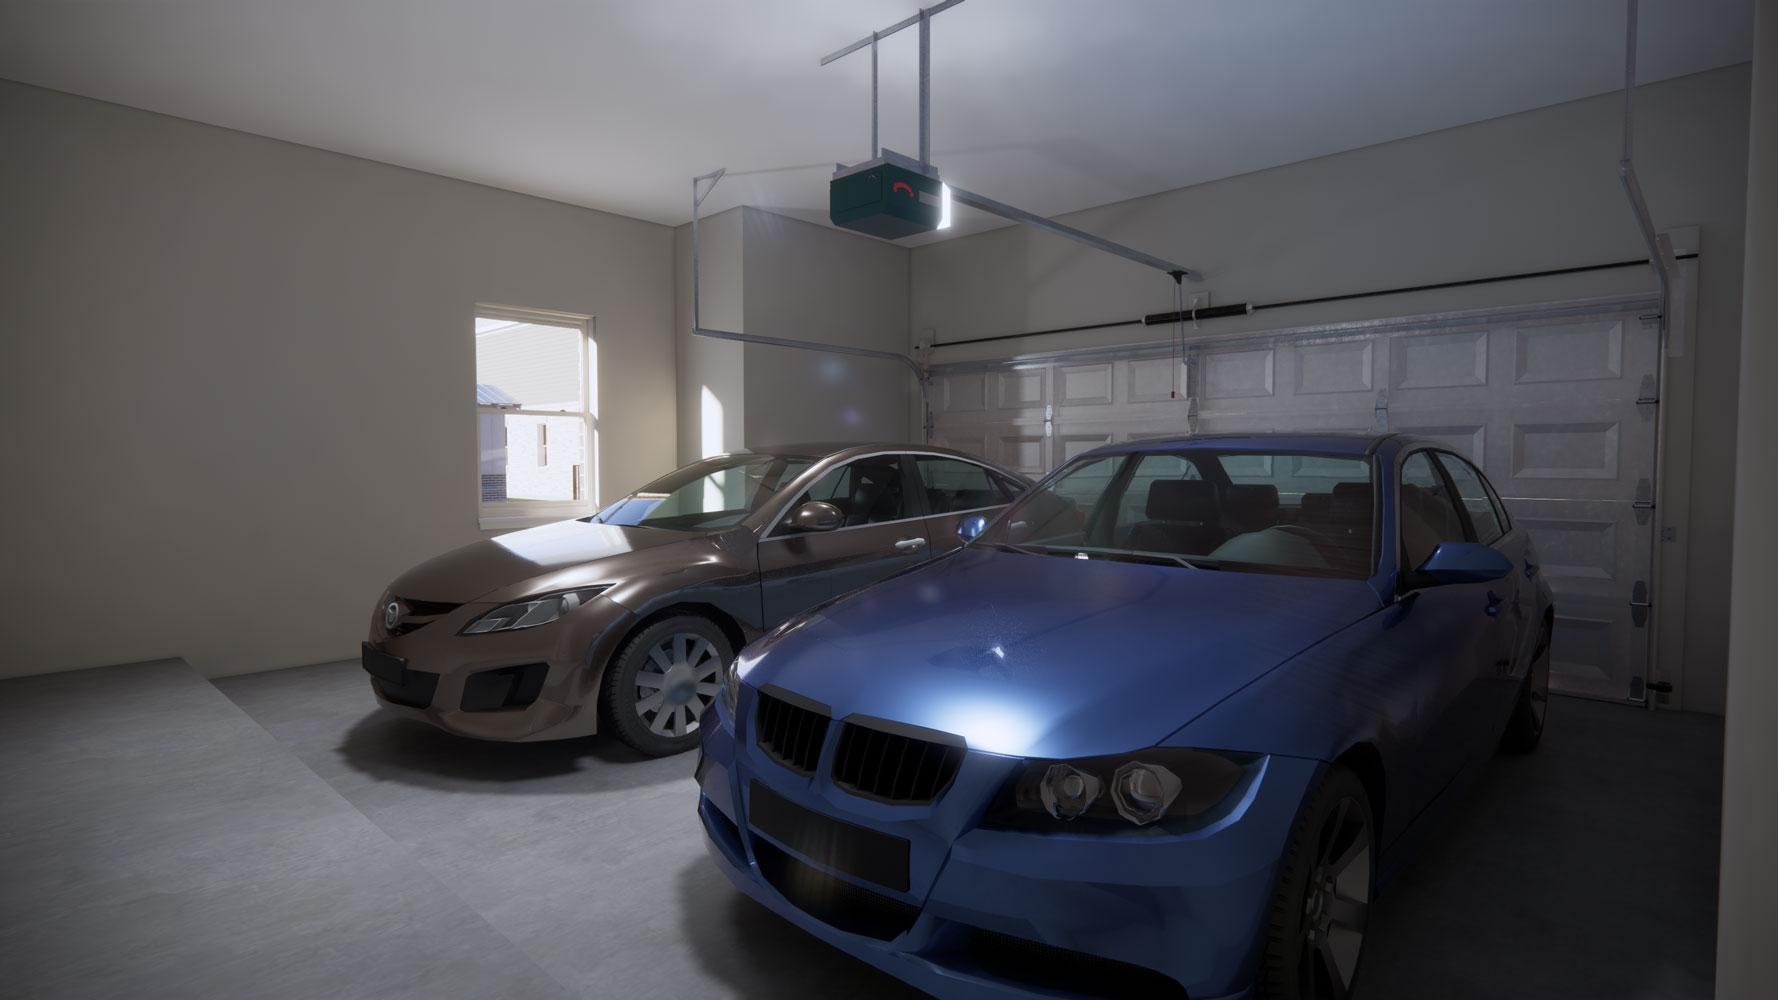 Two-Car Garage at Echelon at Reverchon Bluffs in Dallas, Texas